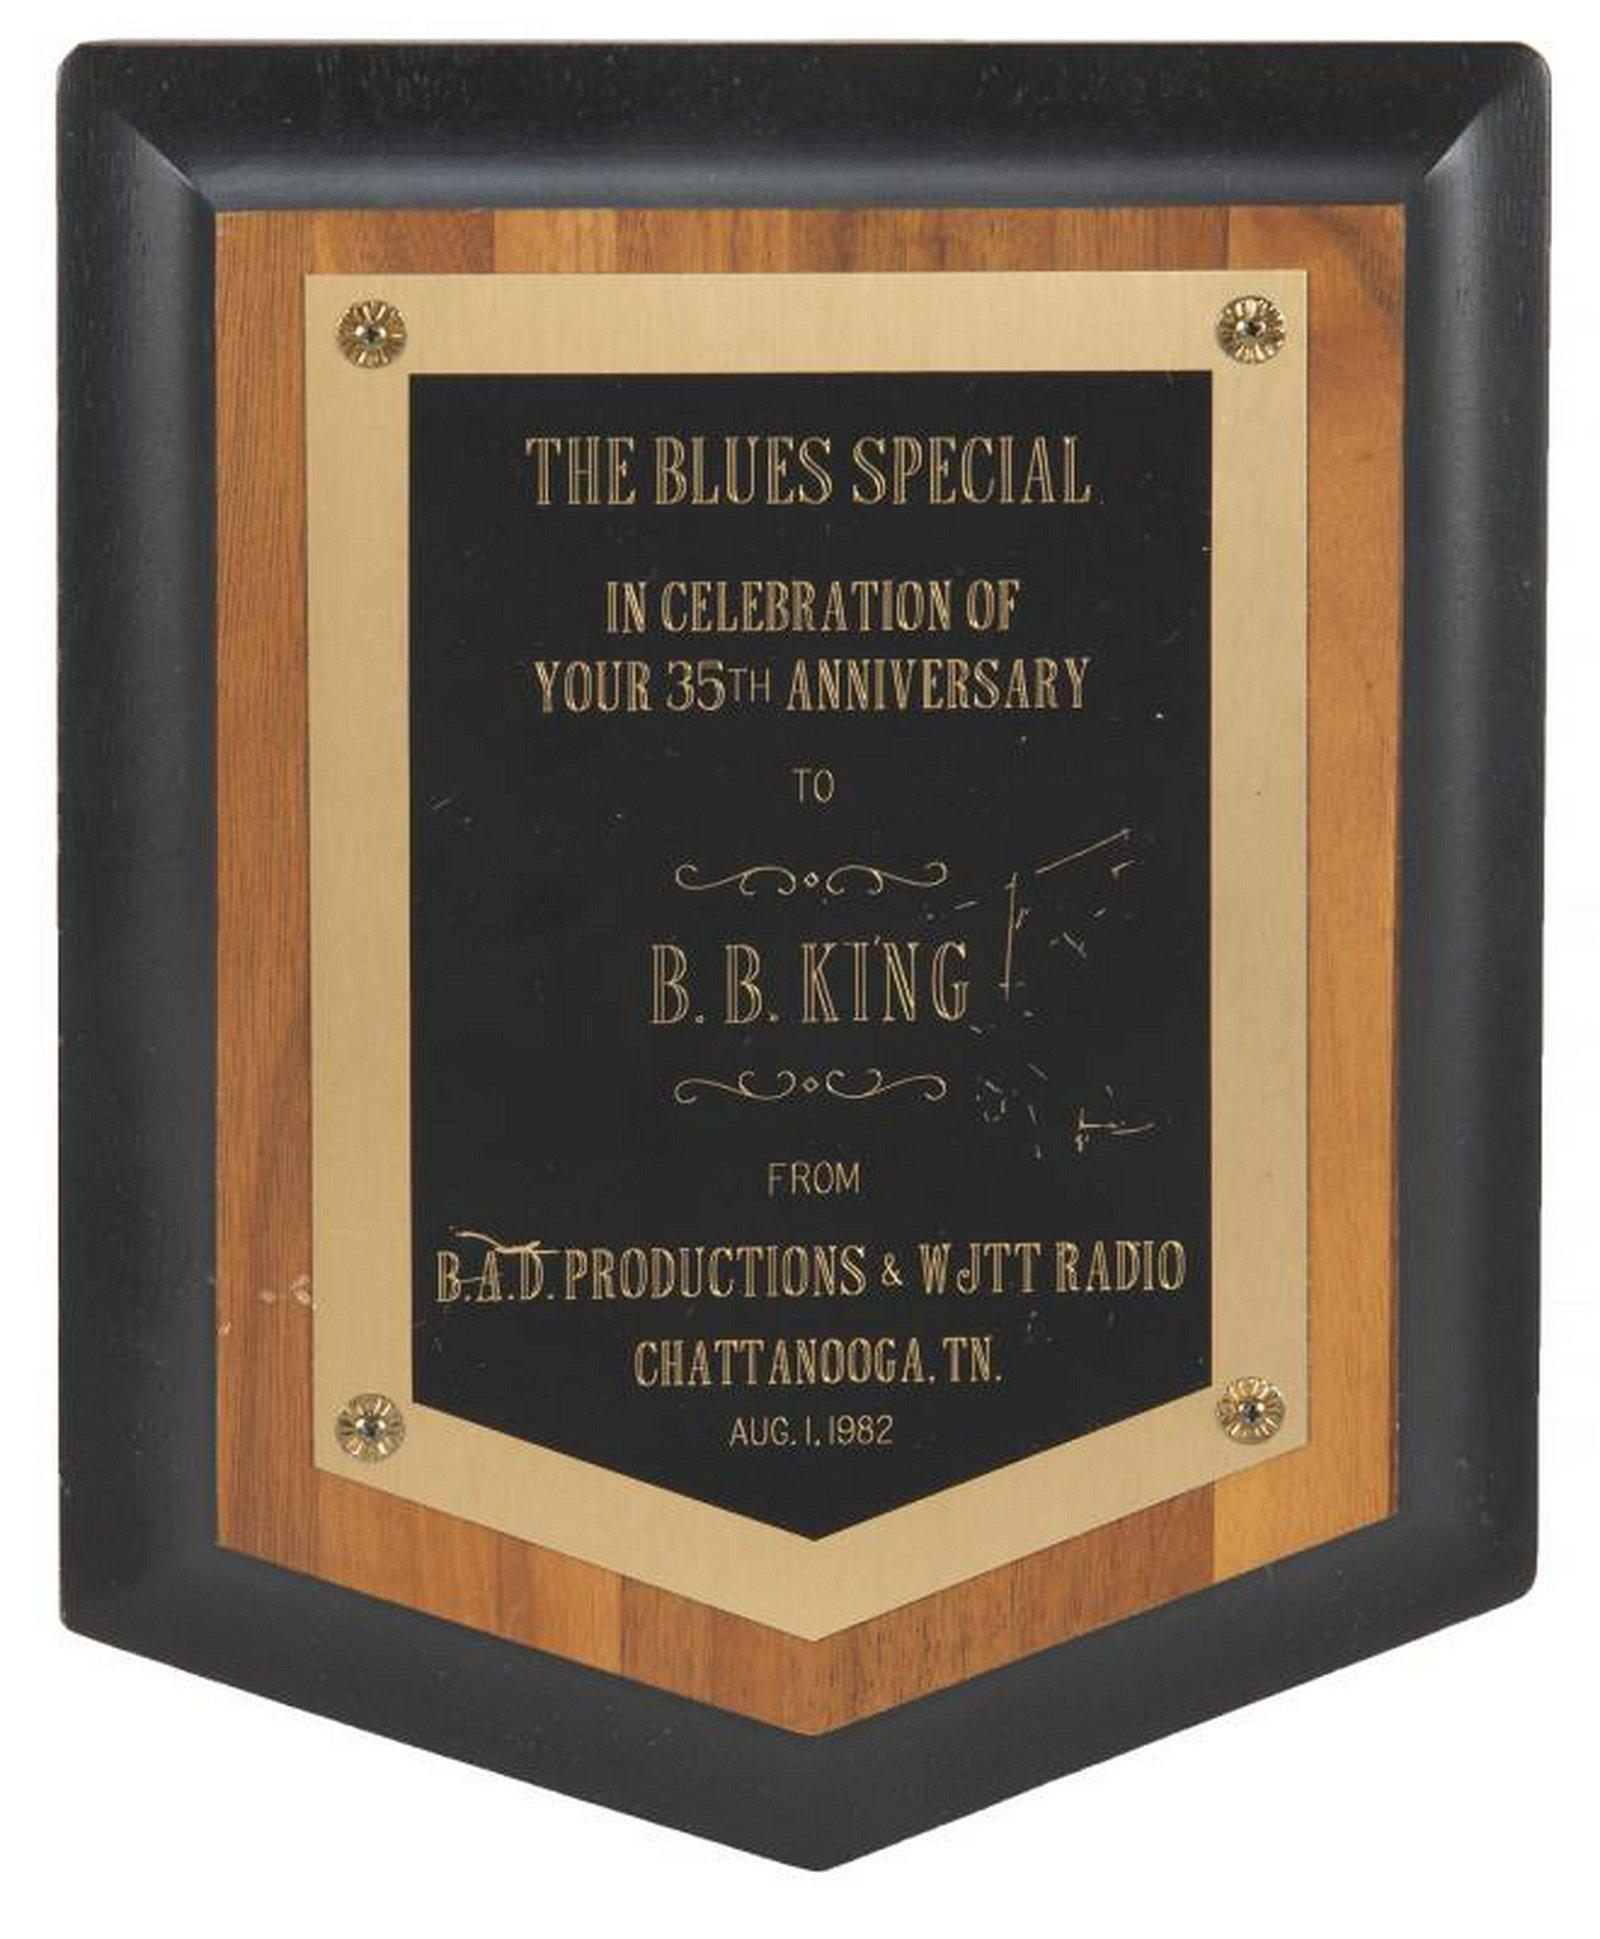 B.B. KING AWARD PLAQUES